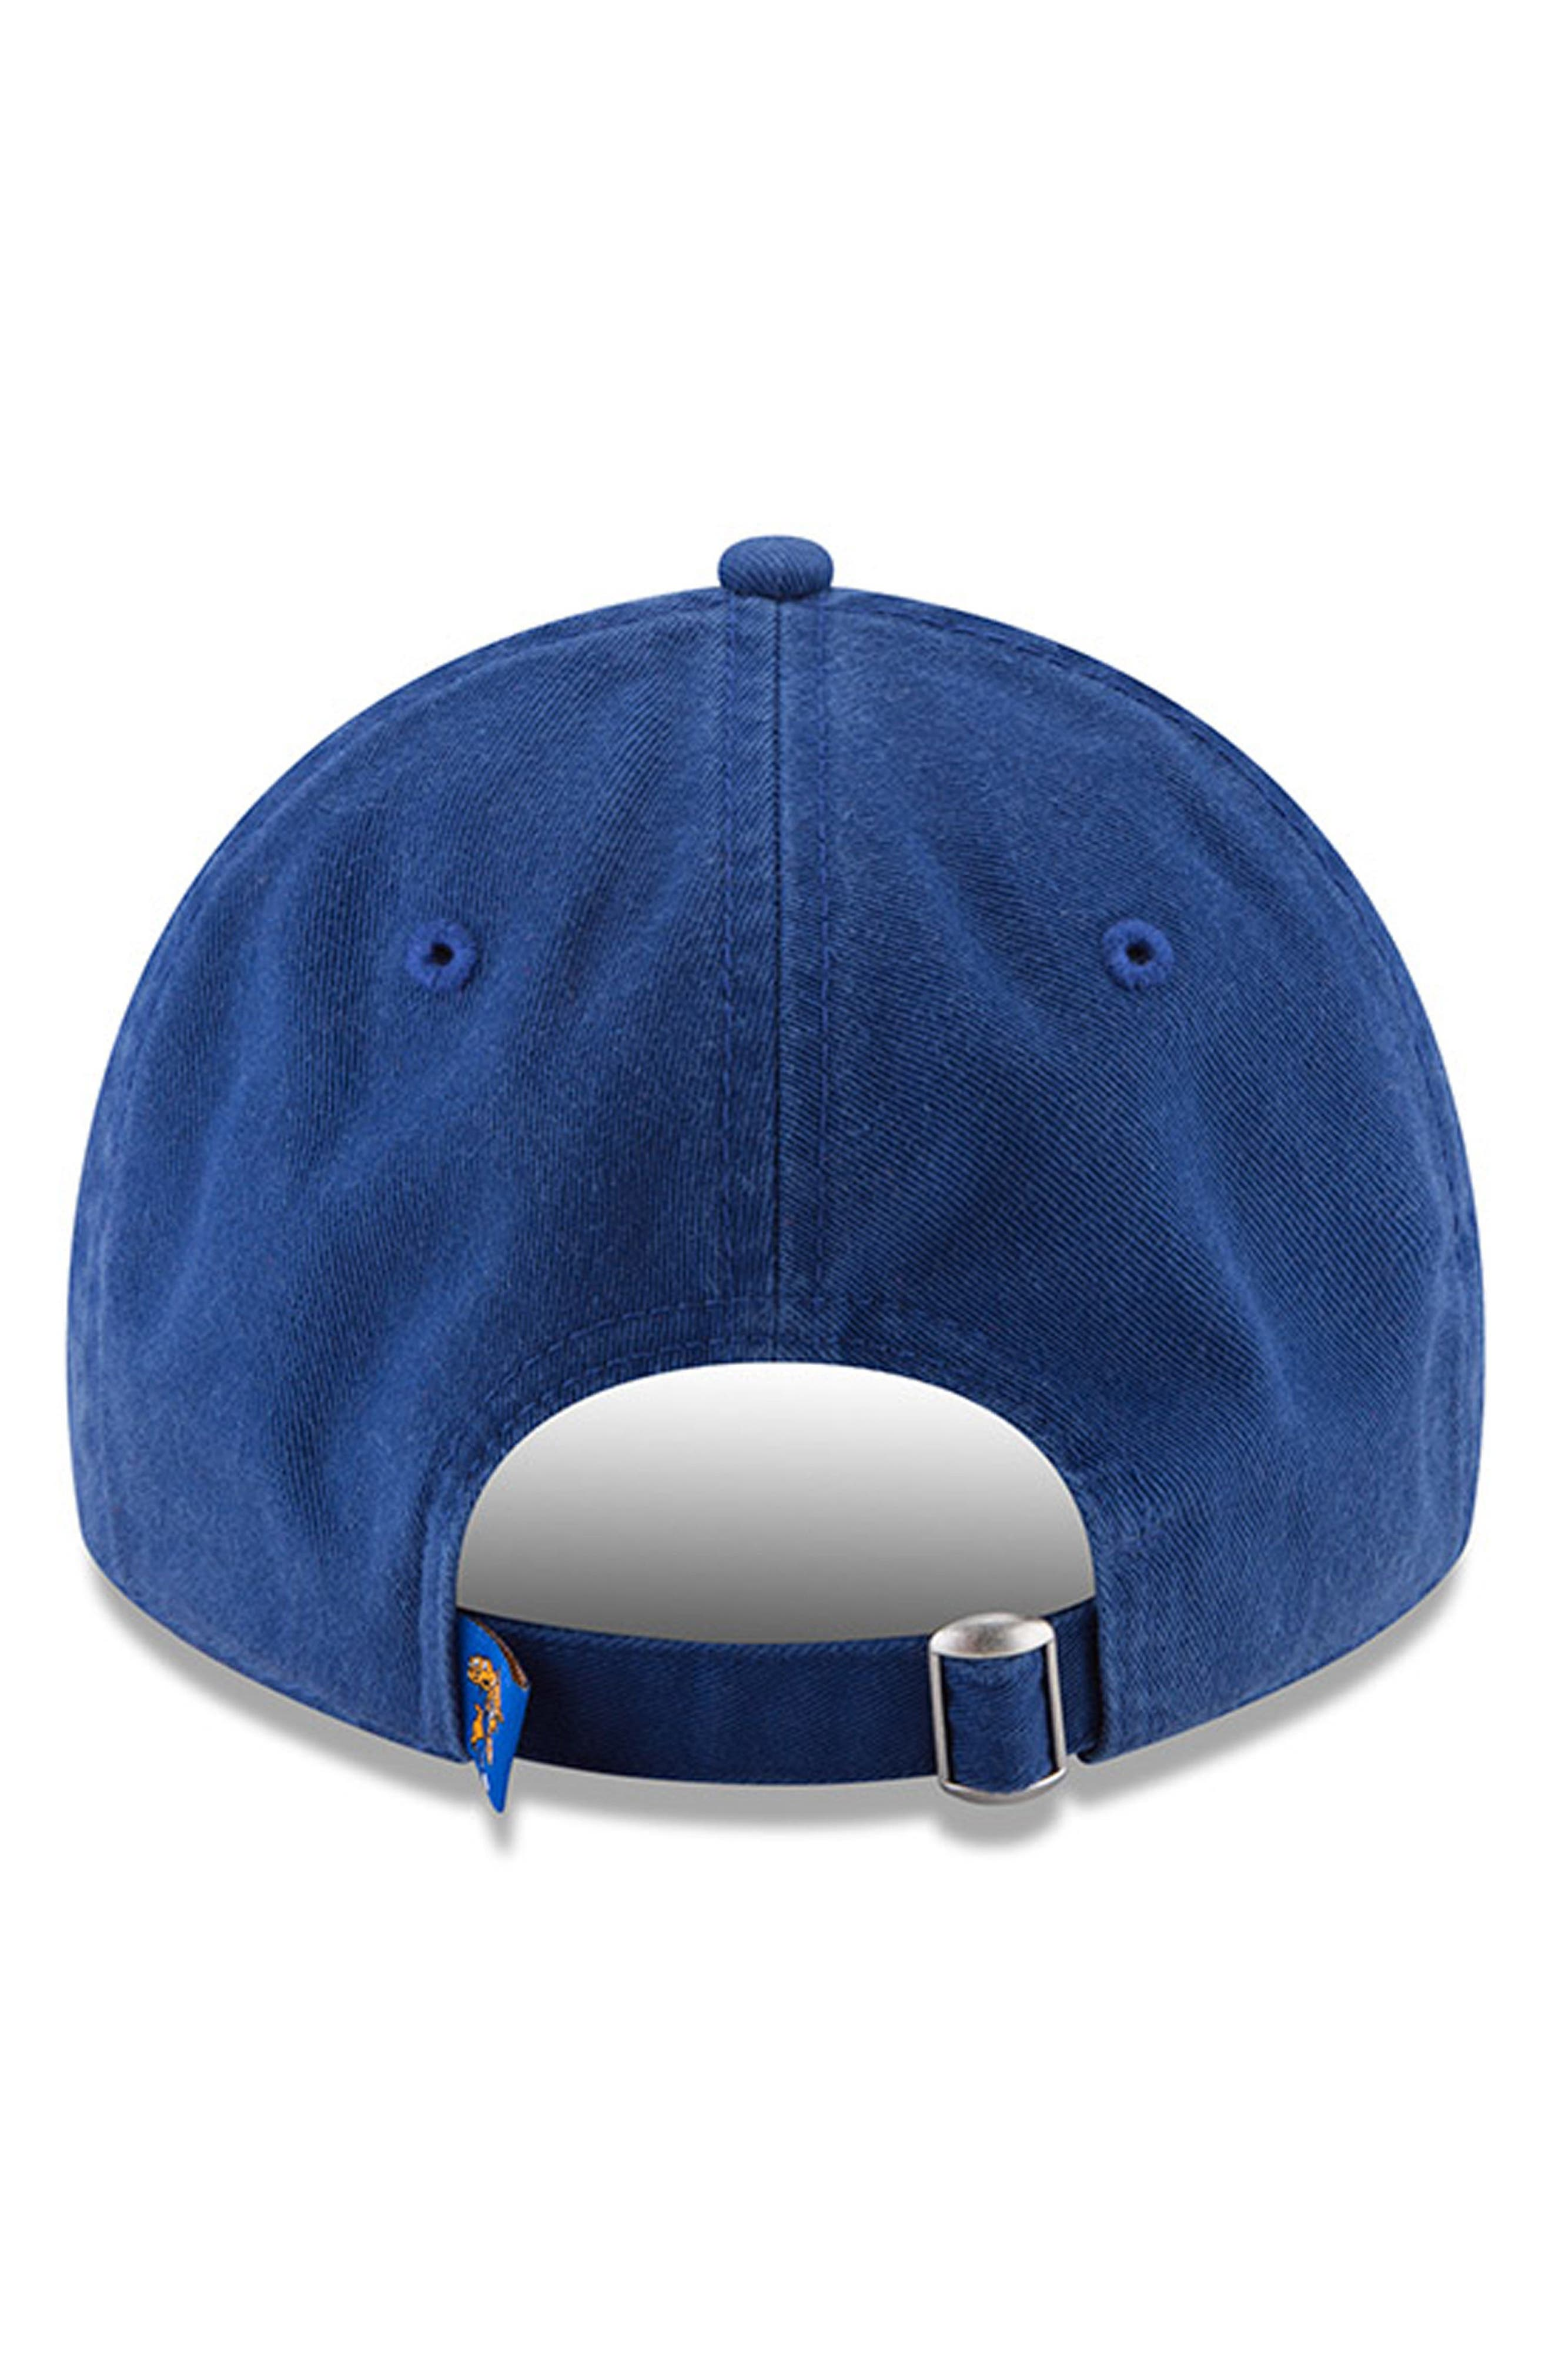 Alternate Image 2  - New Era Collegiate Core Classic - Kentucky Wildcats Baseball Cap